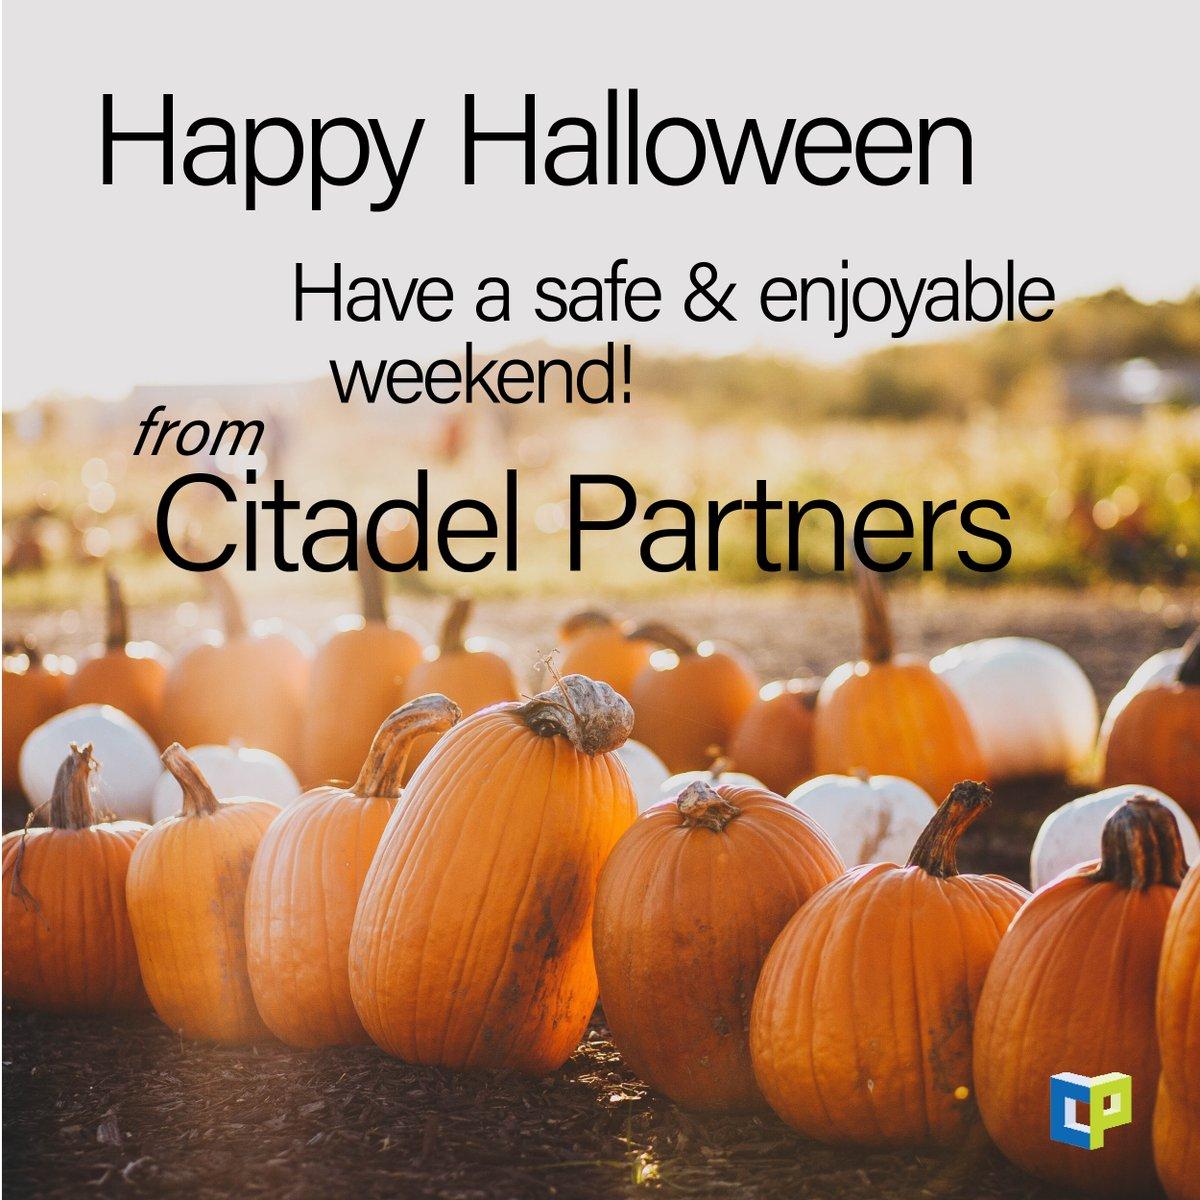 test Twitter Media - Happy Halloween! Have a safe & enjoyable weekend!  #CitadelPartners #DallasCommercialRealEstate #Halloween2020 https://t.co/sAey2ztjeF